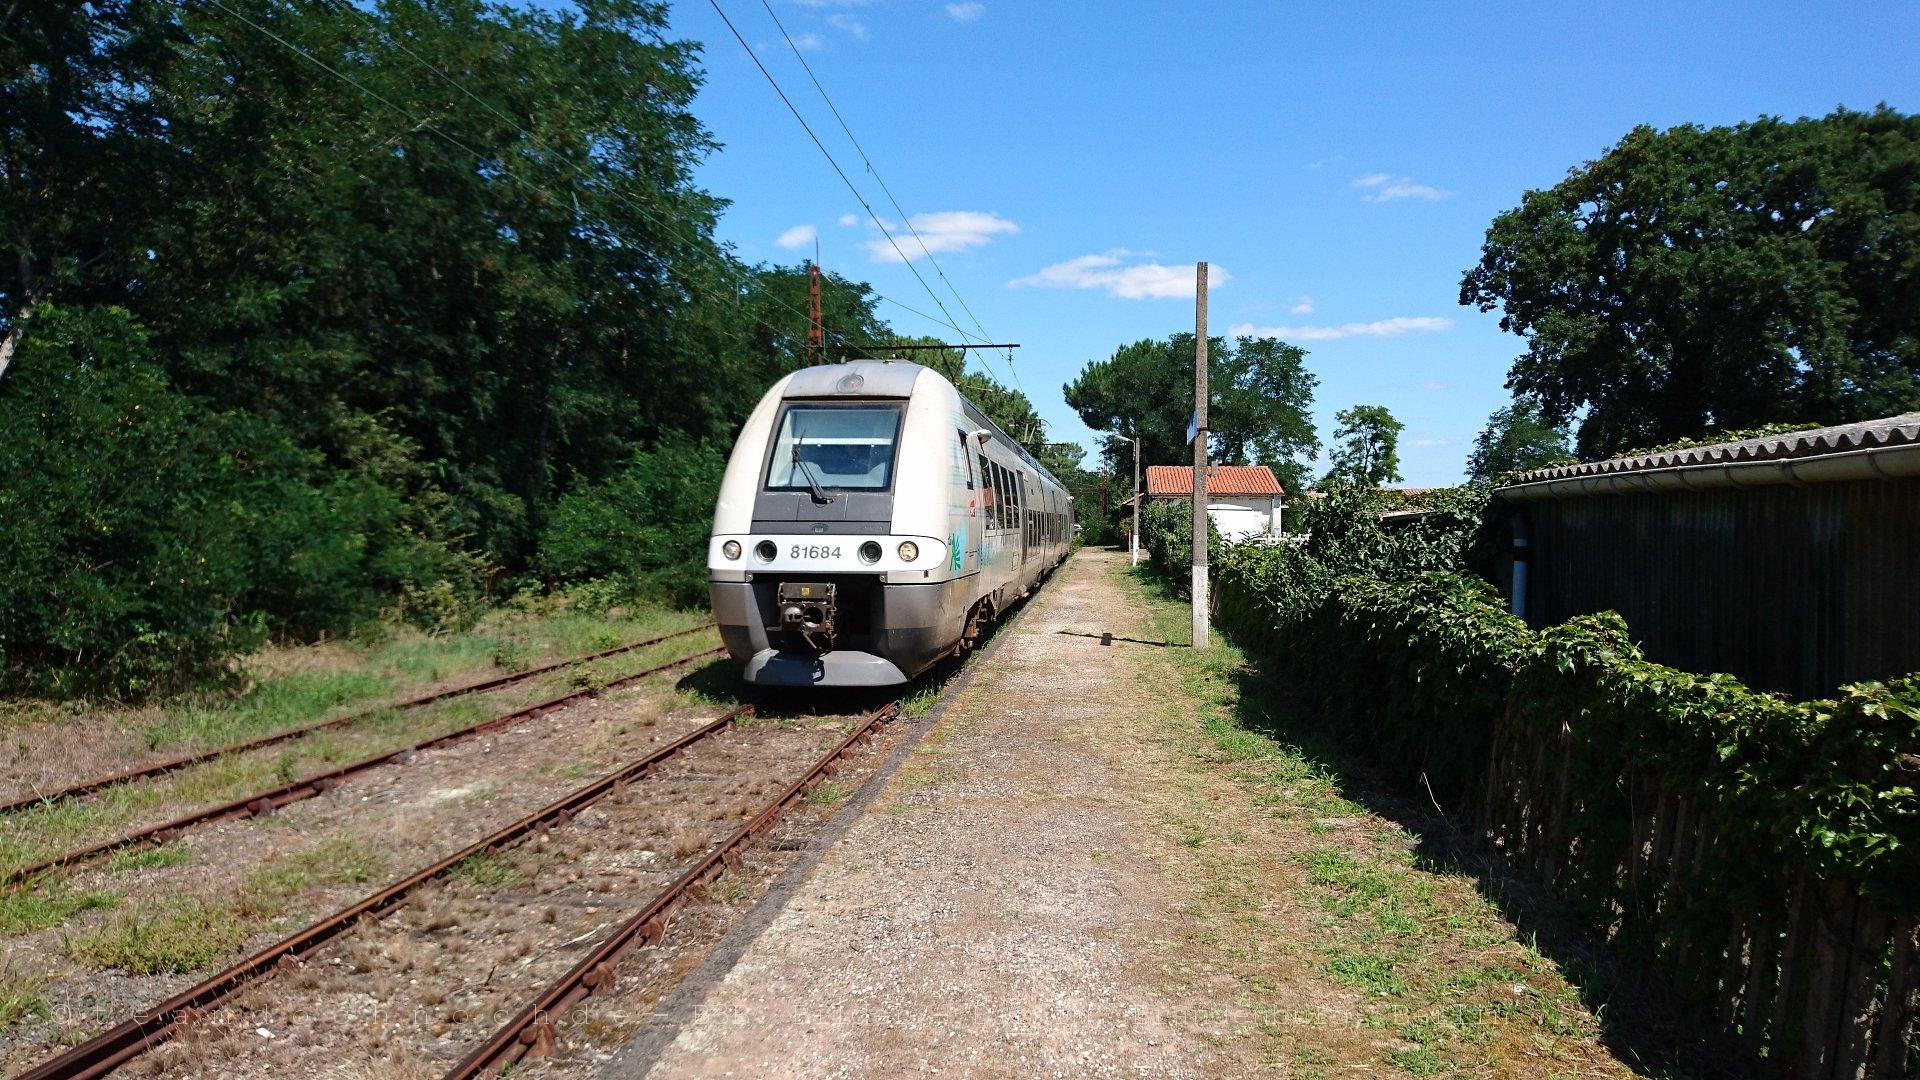 81683/81684 im Bahnhof Pointe de Grave